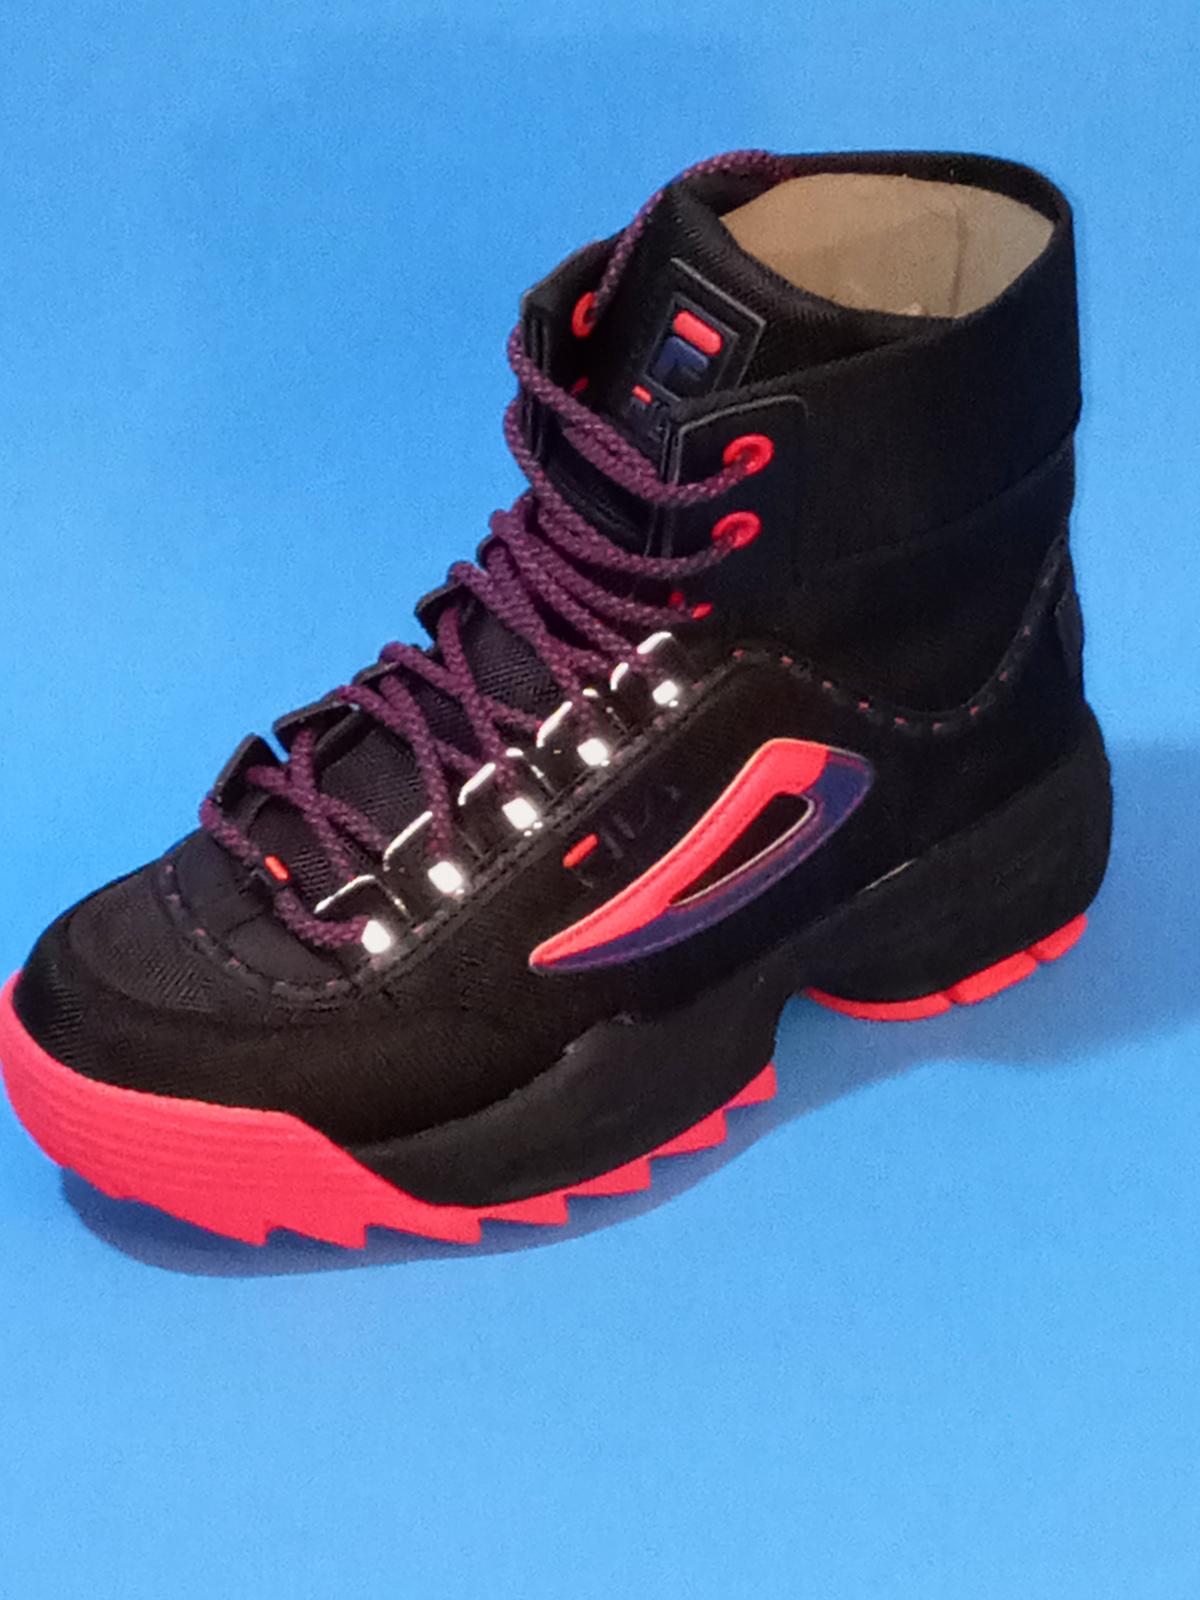 NEW Womens FILA Disruptor Ballistic Black Pink Sneaker Boots Tall Reflective Box - $84.97